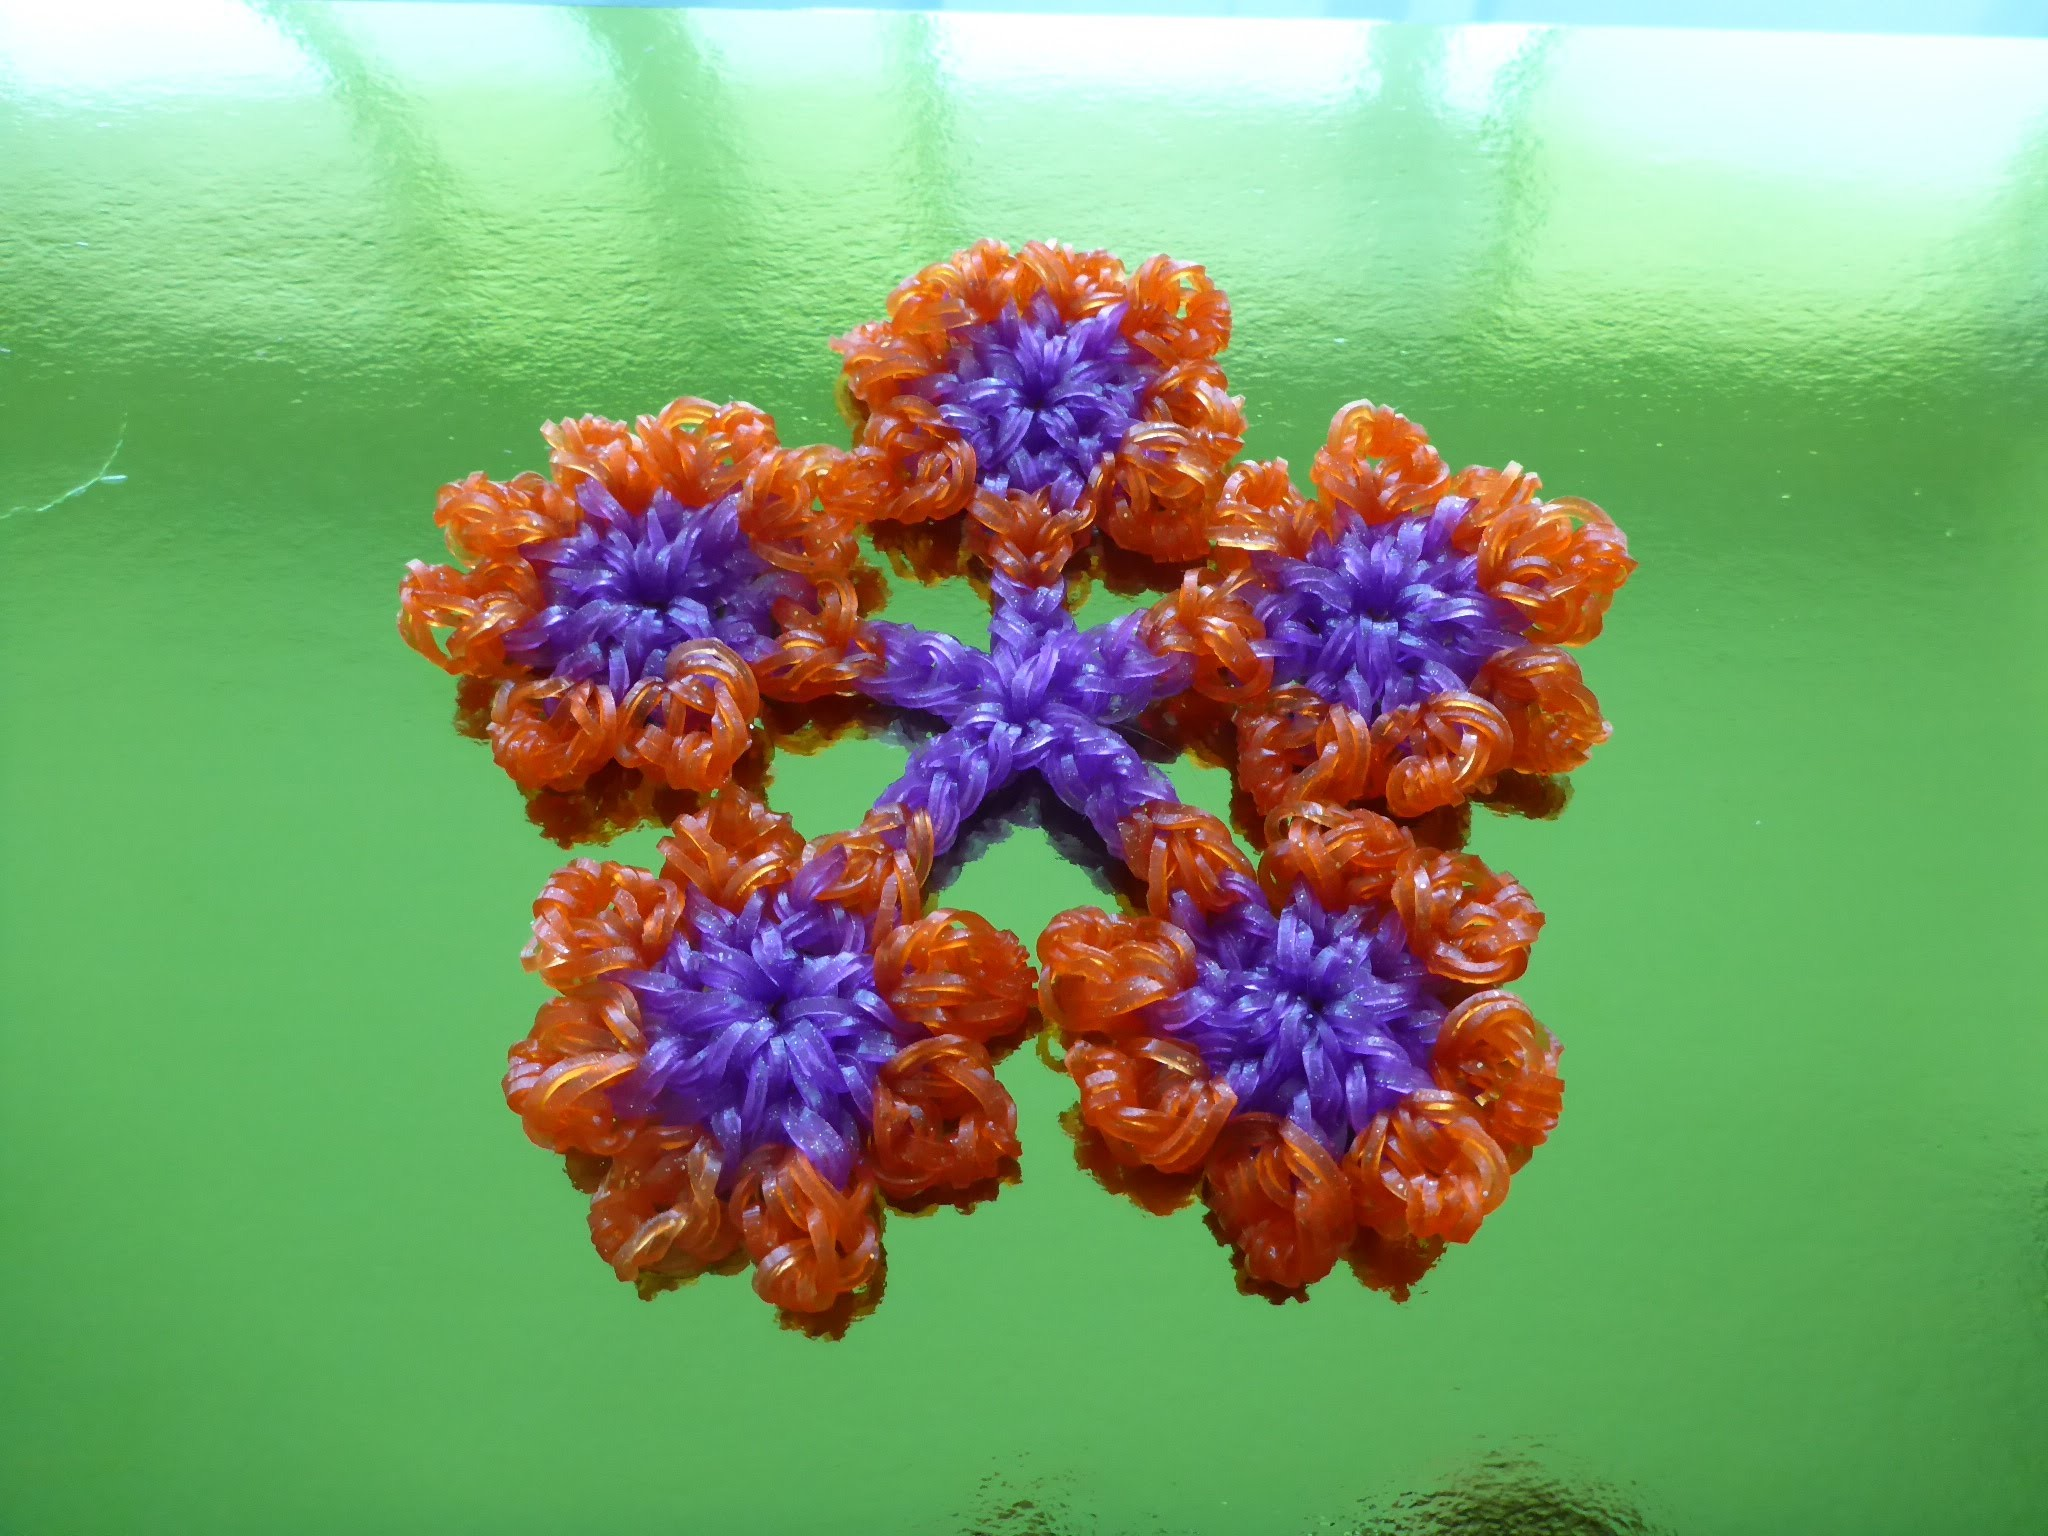 DIY Loom Bands Blumen, Geschenk zum Muttertag, Mother´s day Gift Ideas Flower, Anleitung, Tutorial